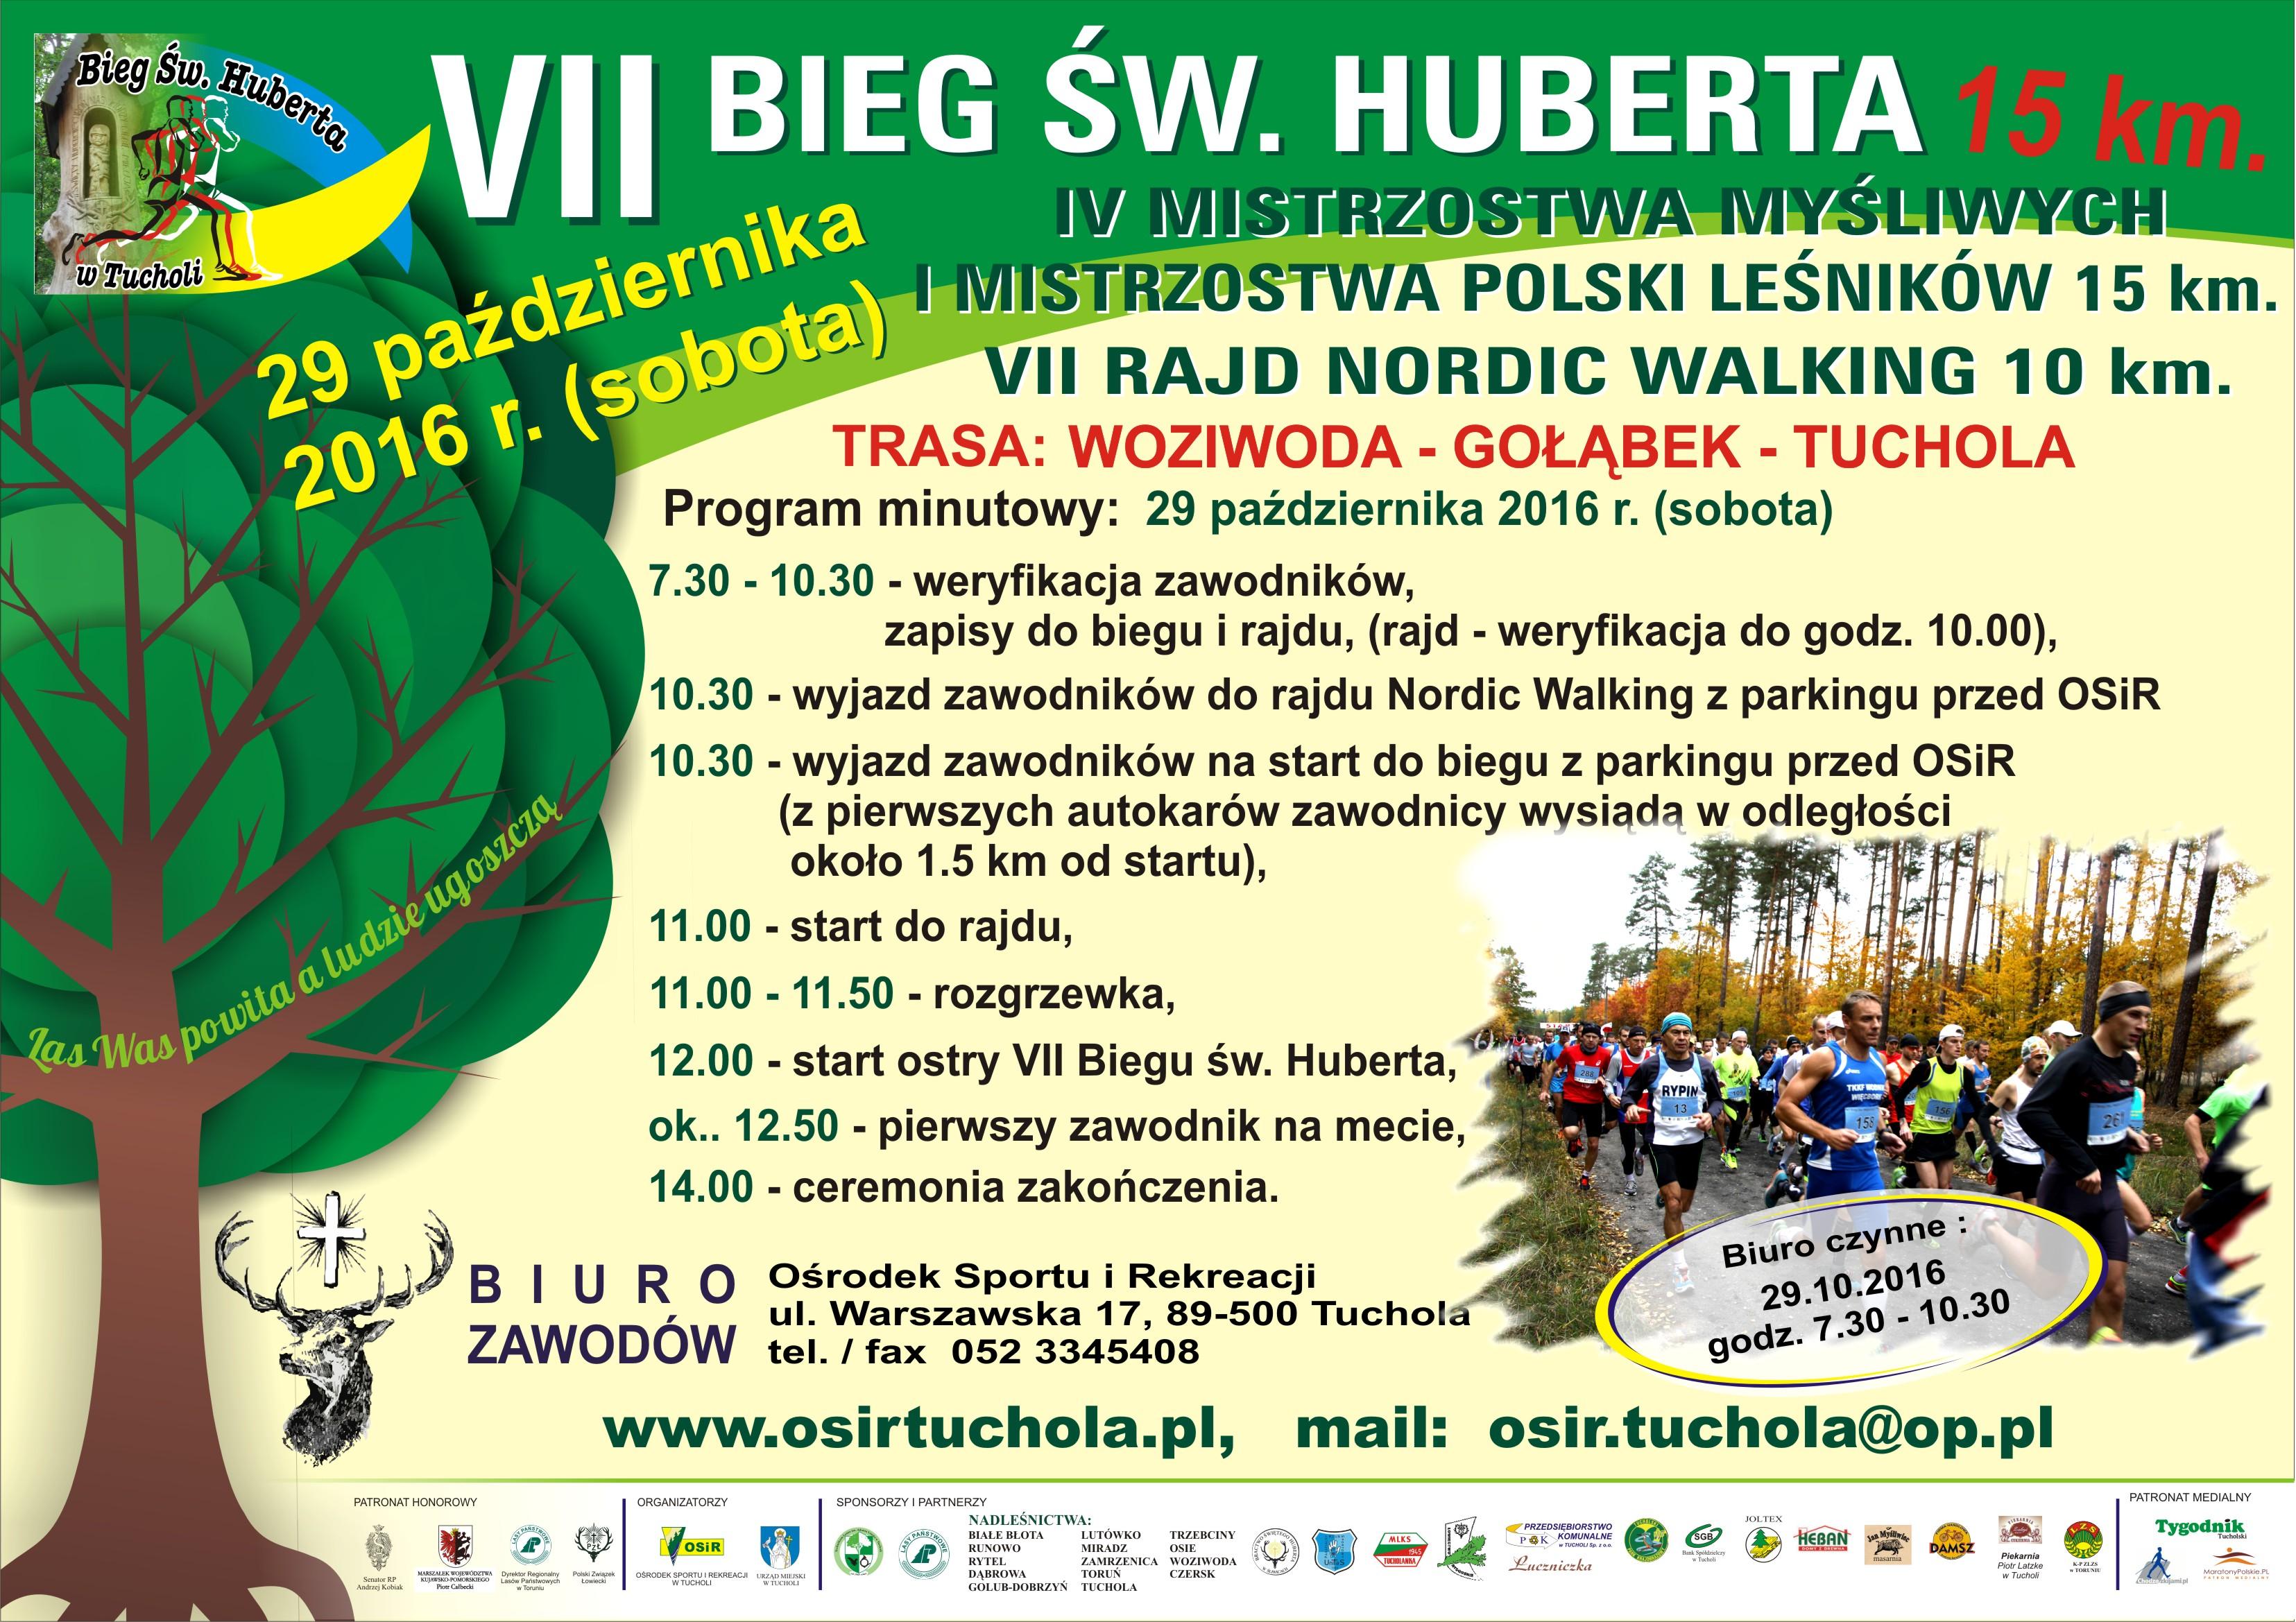 http://www.osirtuchola.pl/wp-content/uploads/2016/06/PLAKAT2.jpg